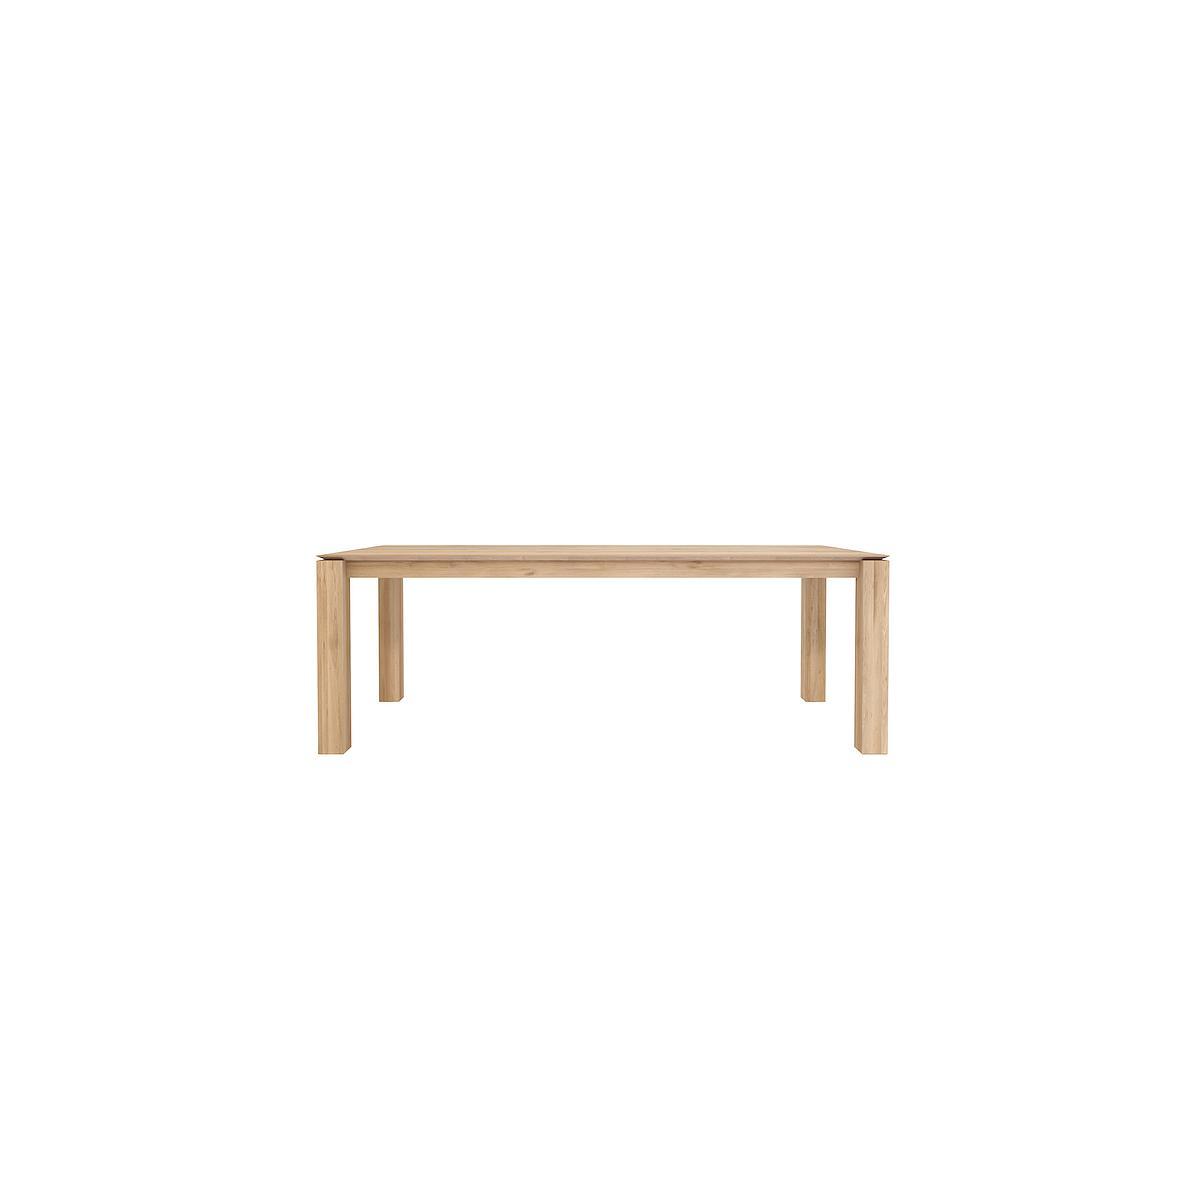 SLICE by  Ethnicraft Table chêne 220x100 cm